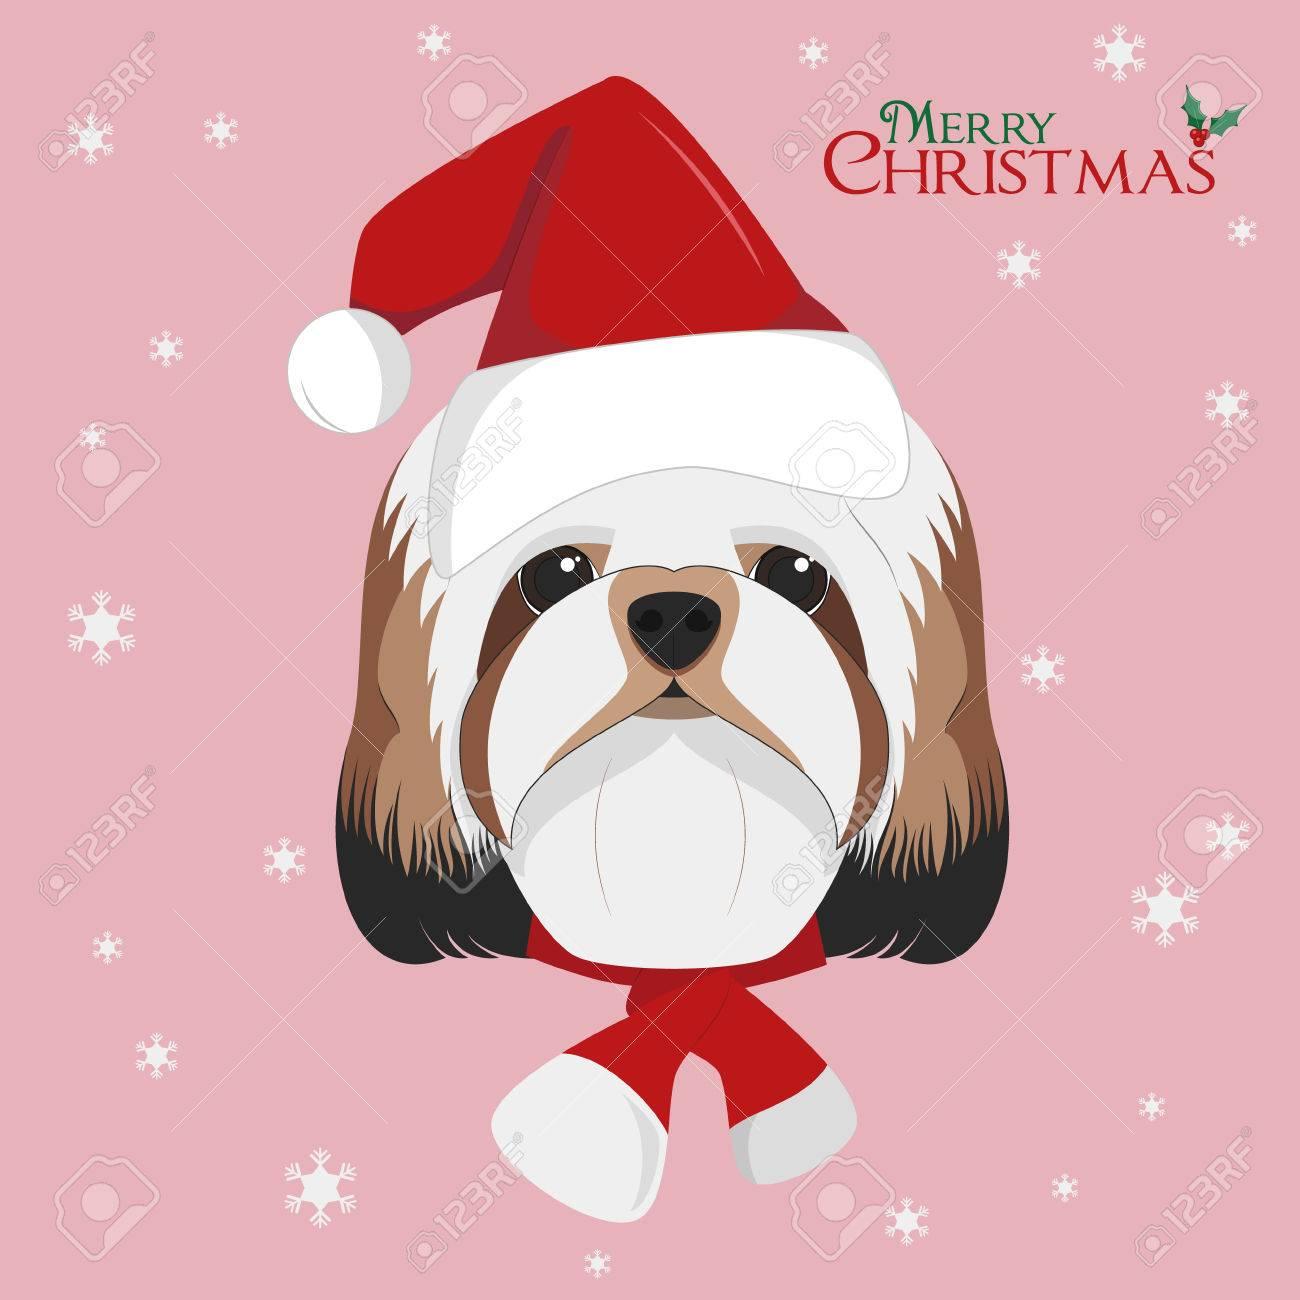 Christmas Greeting Card Shitzu Dog With Red Santas Hat Royalty